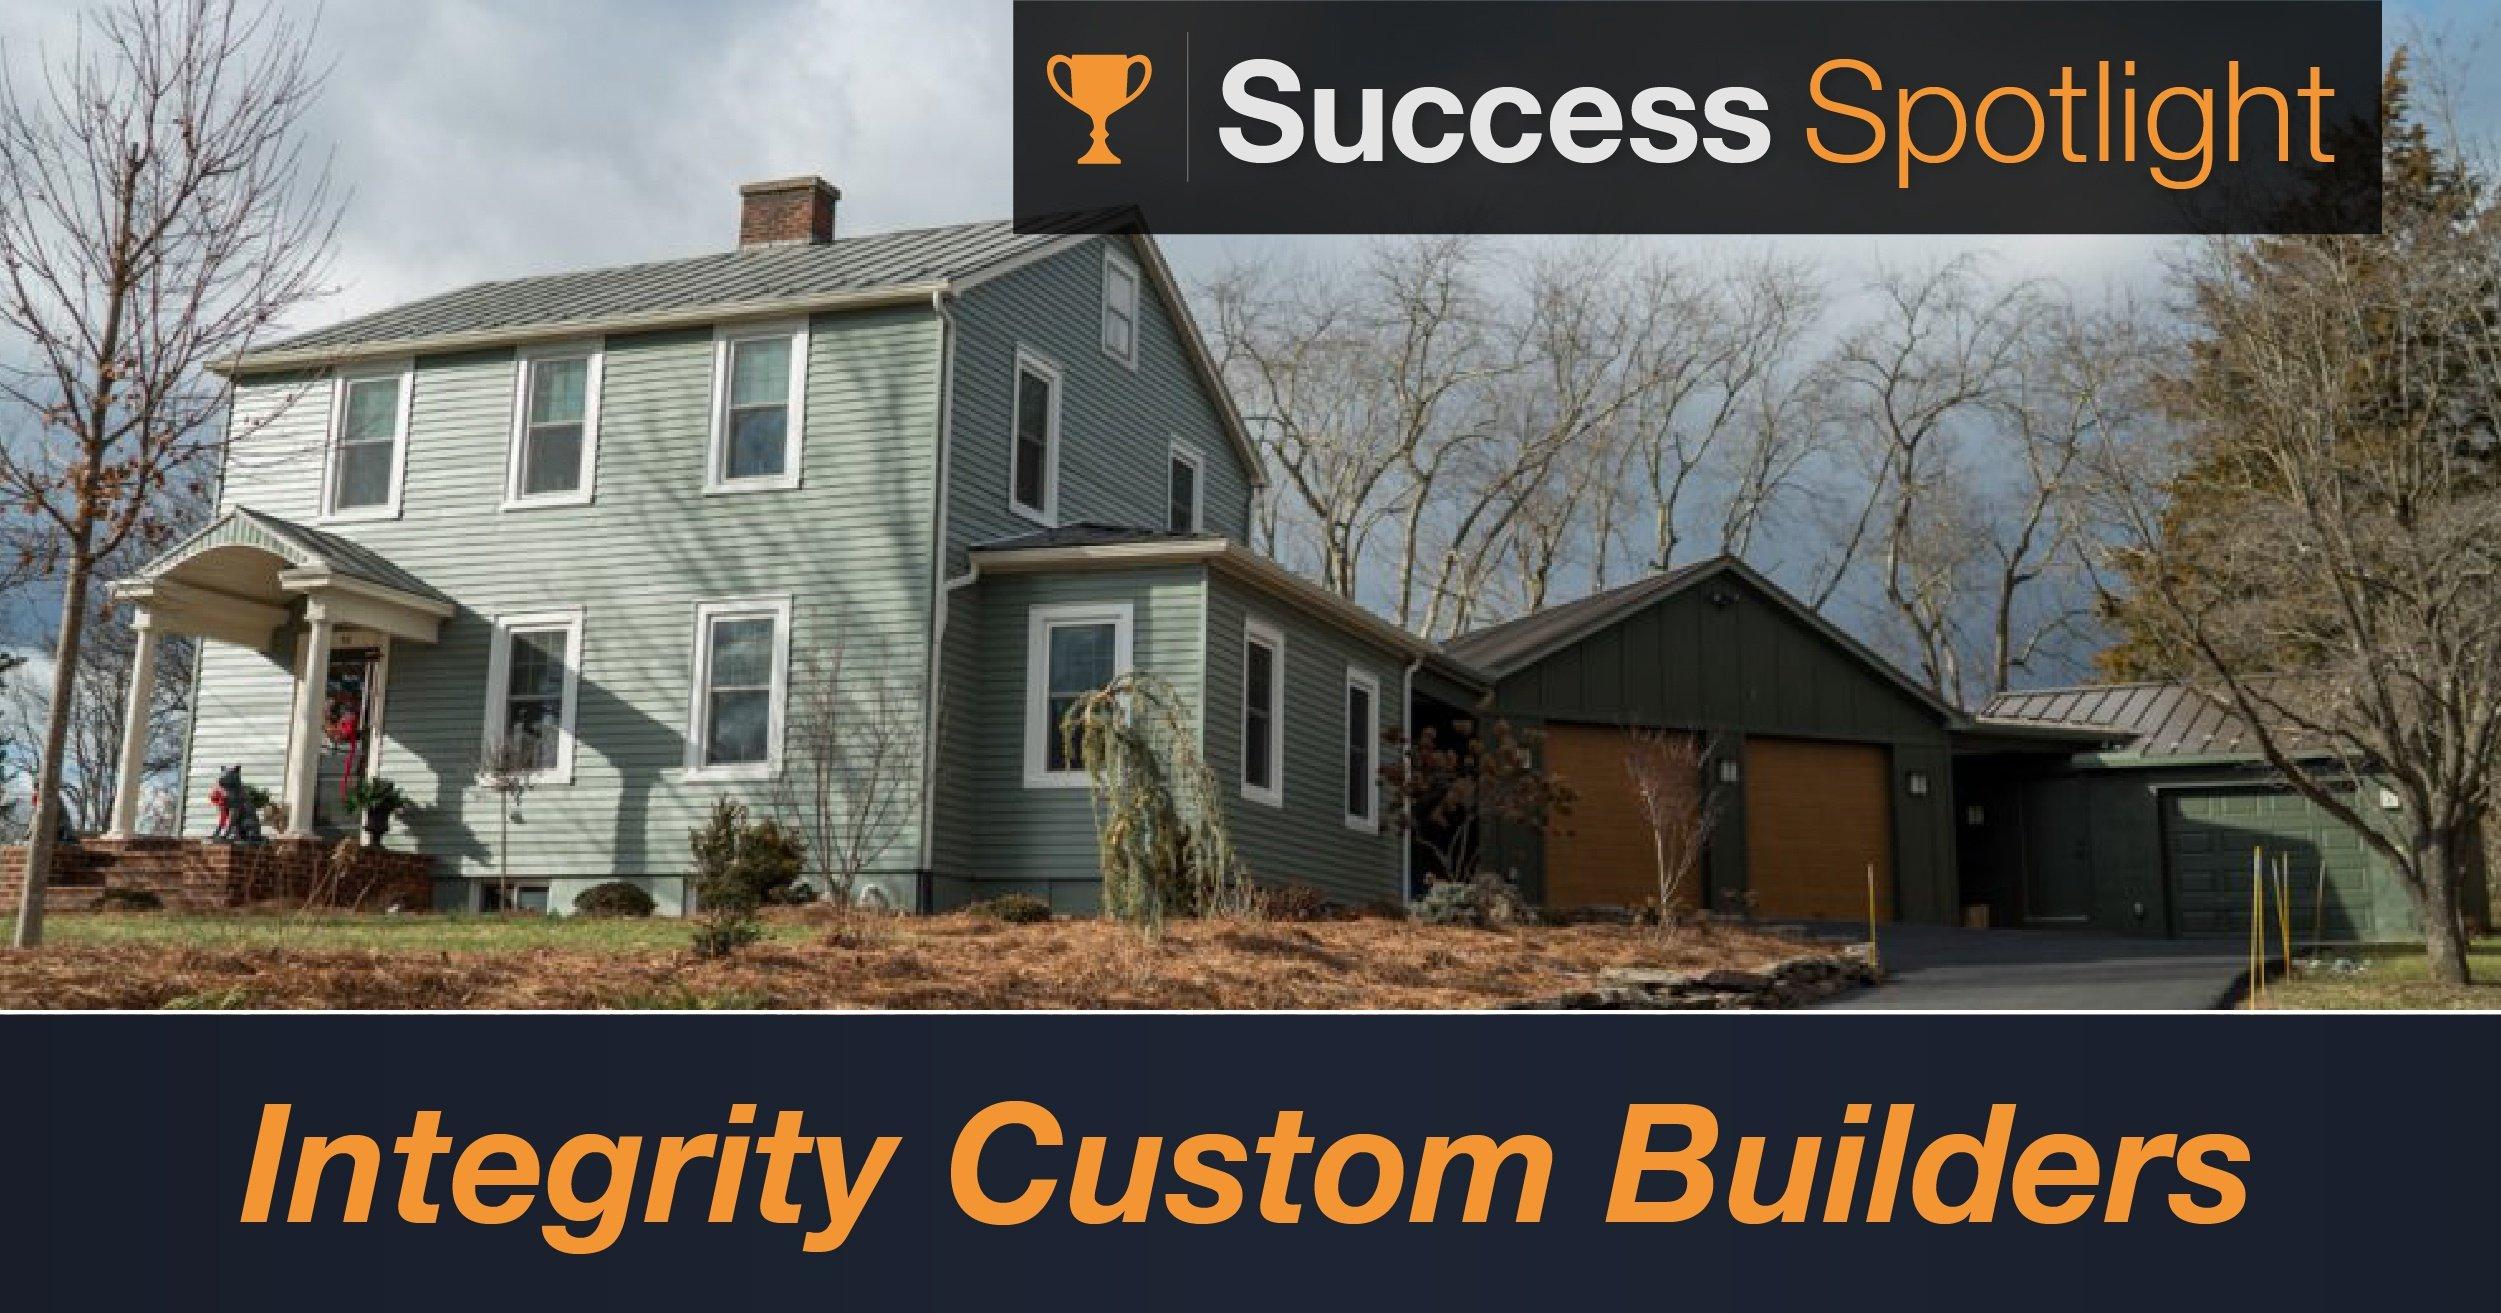 Success Spotlight: Integrity Custom Builders